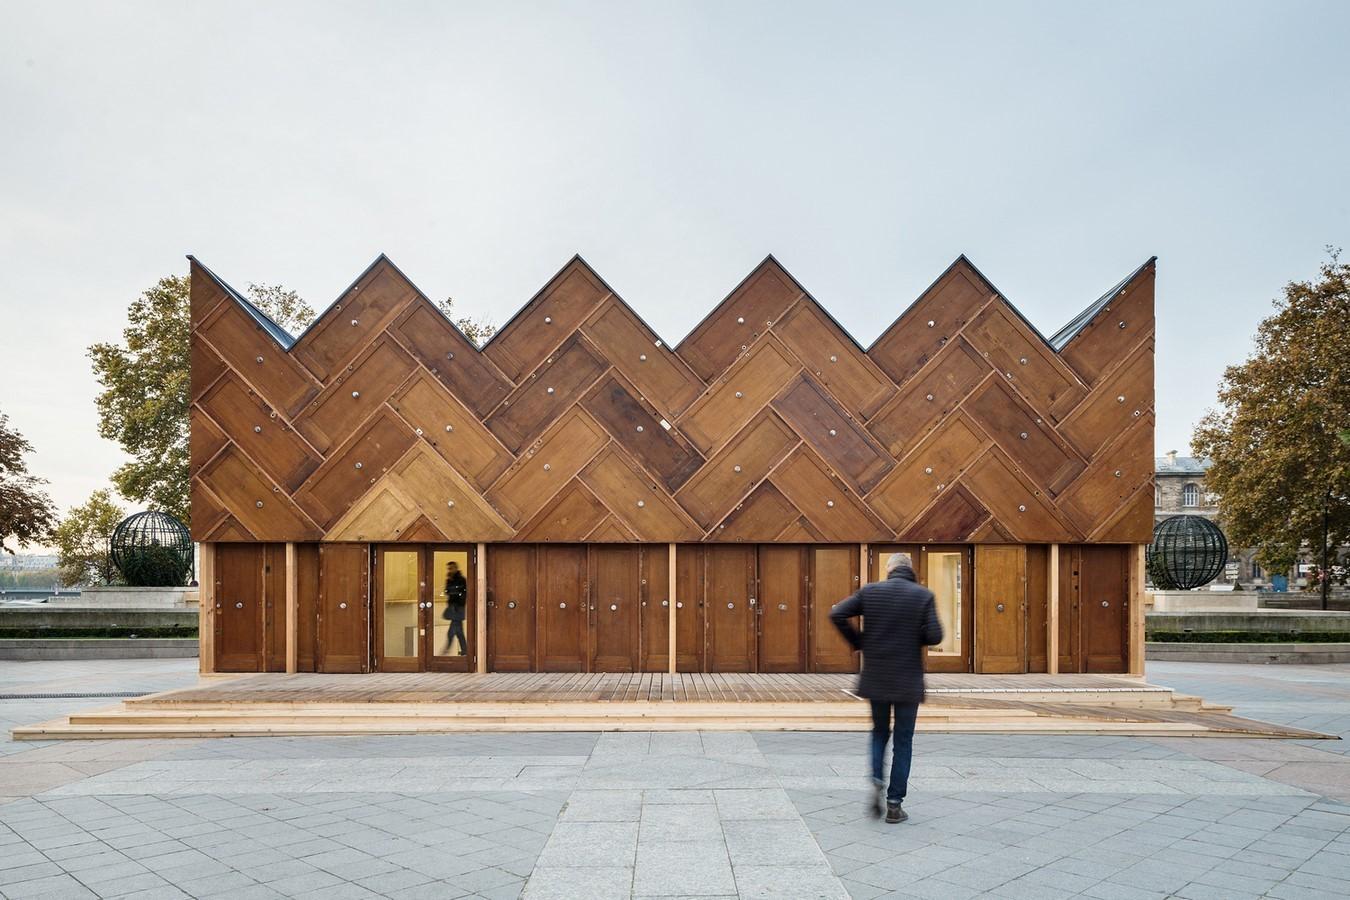 Project - The Circular Pavilion, Paris, France- sheet1